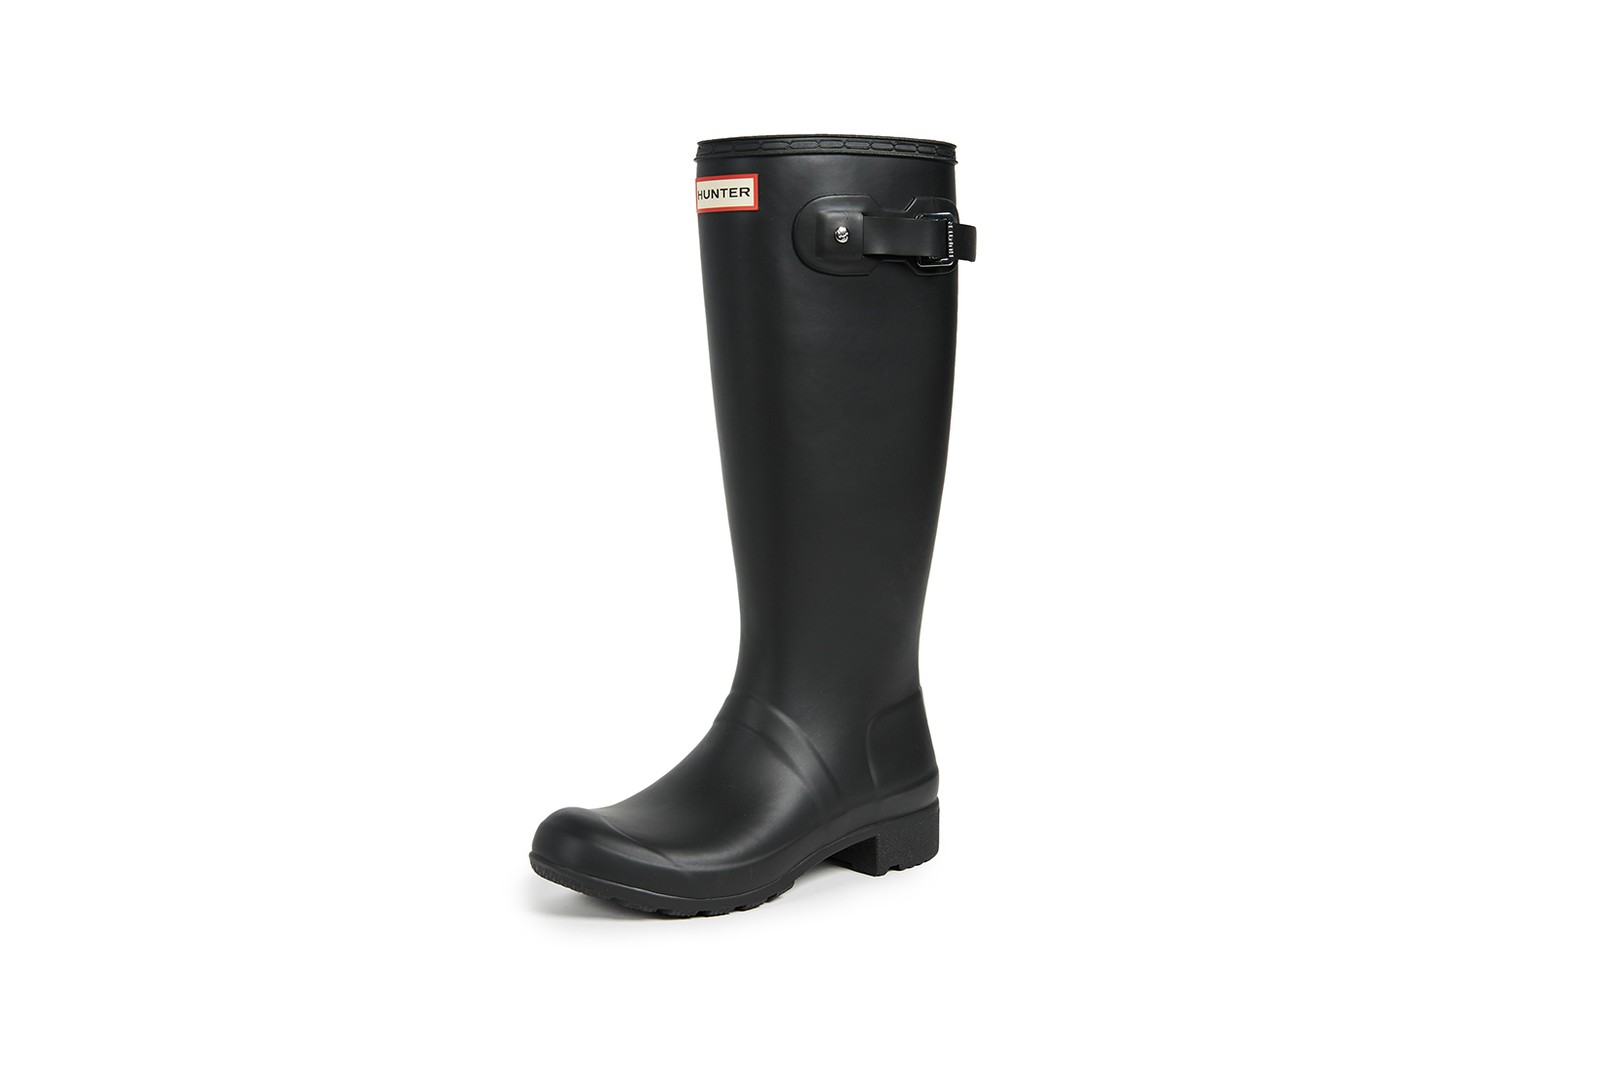 best shoe essentials closet nike hunter birkenstock dr martens calvin klein karl lagerfeld marc jacobs air force 1 sandals sneakers heels ballet flats mules loafers rainboots boots